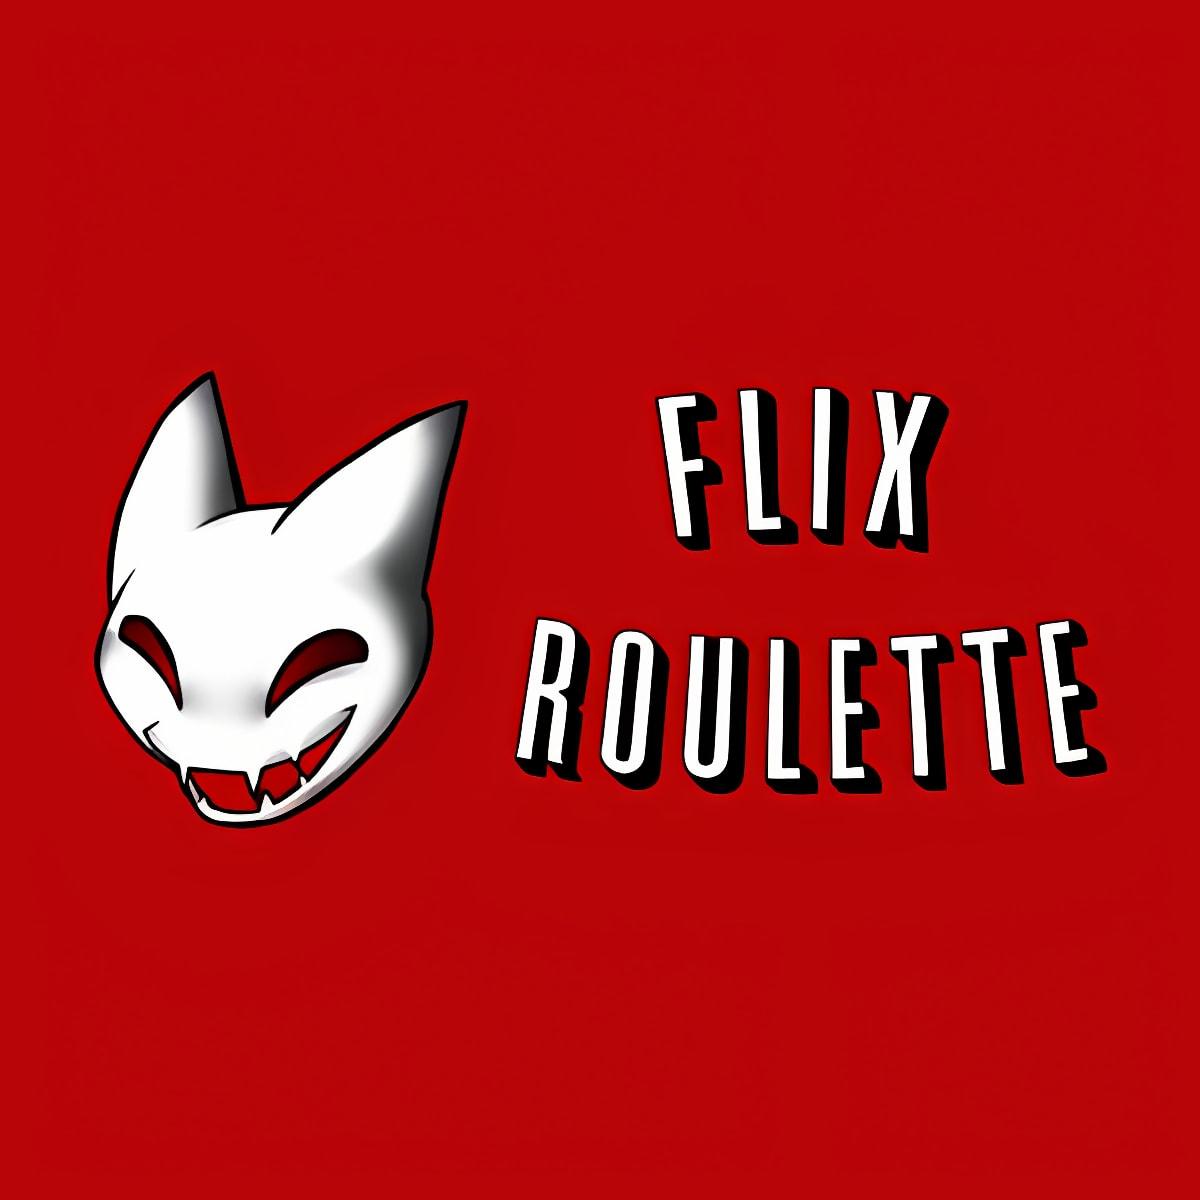 Flix Rulette